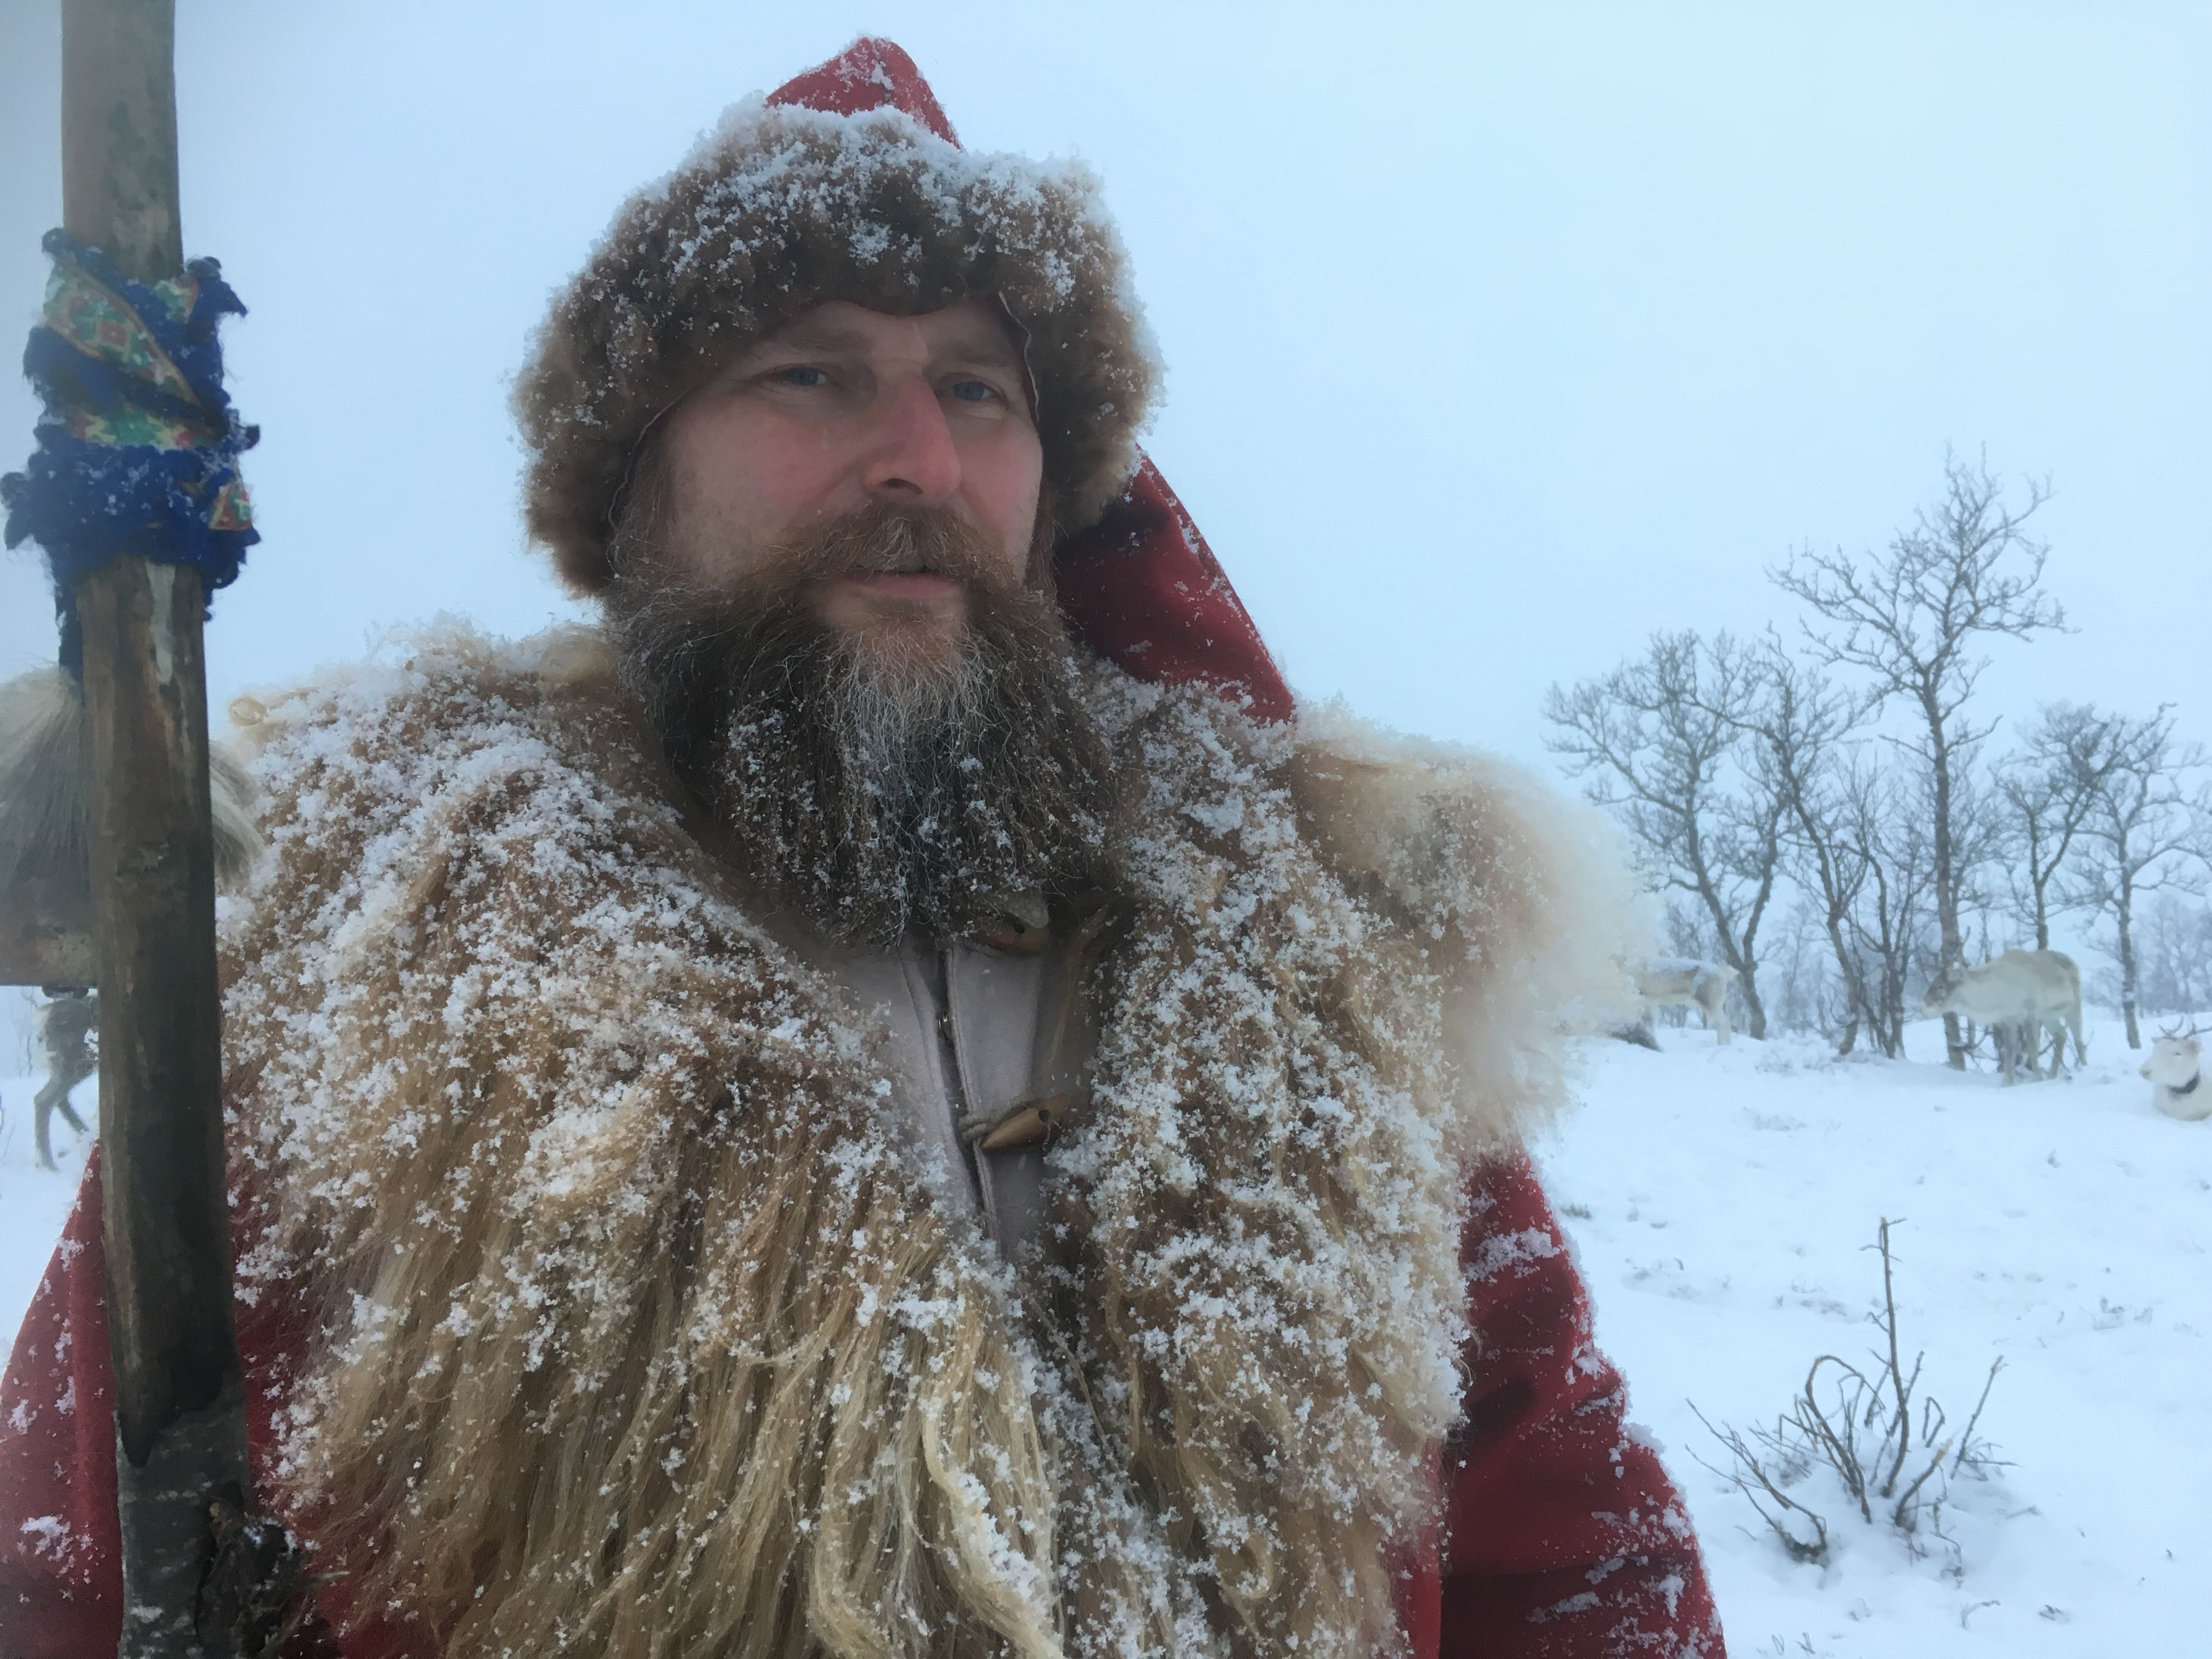 Visit Santa in Snowman - Destination Snowman